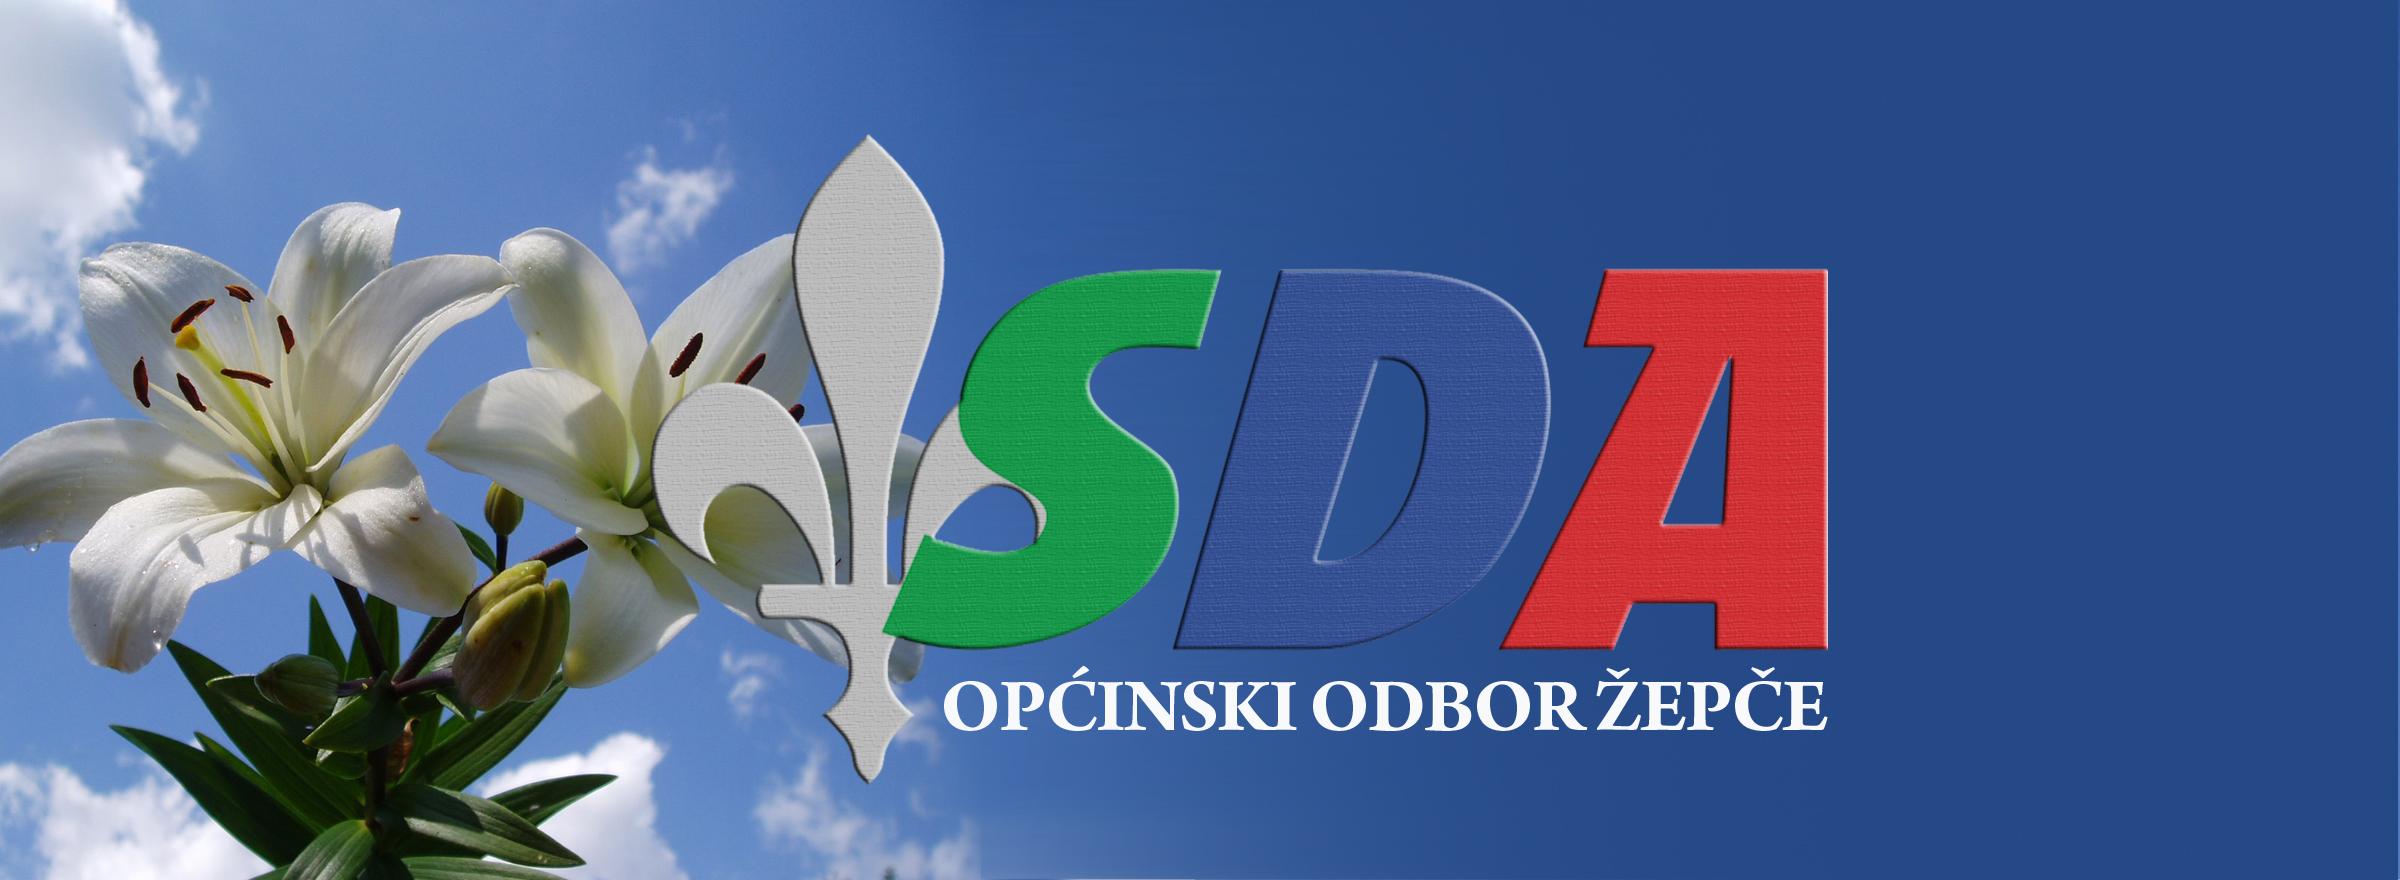 sda-banner3